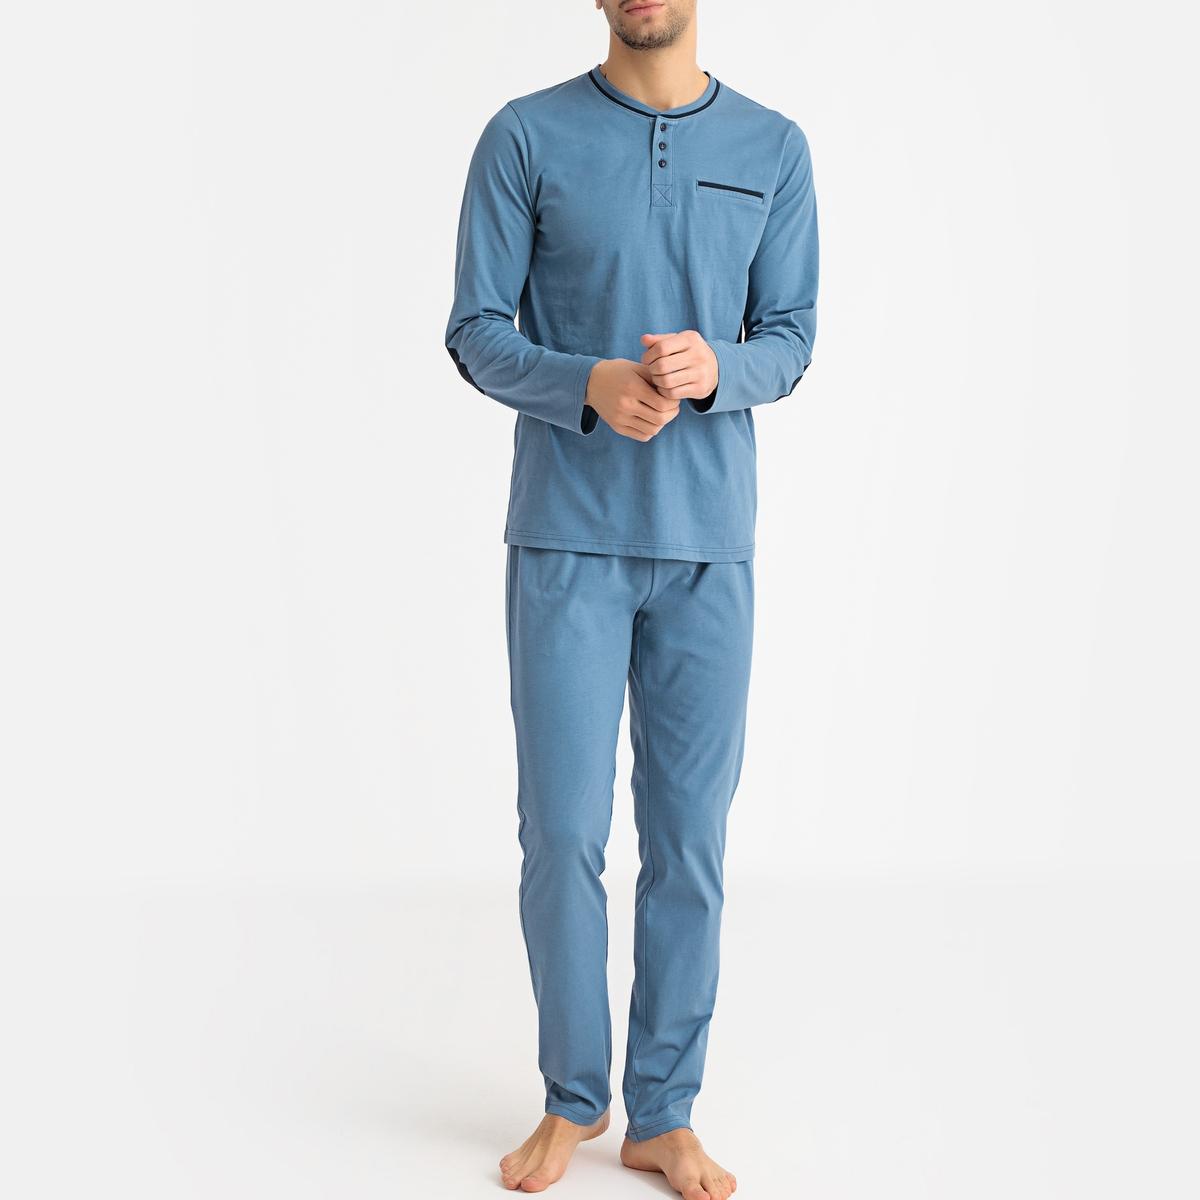 Pijama de mangas compridas